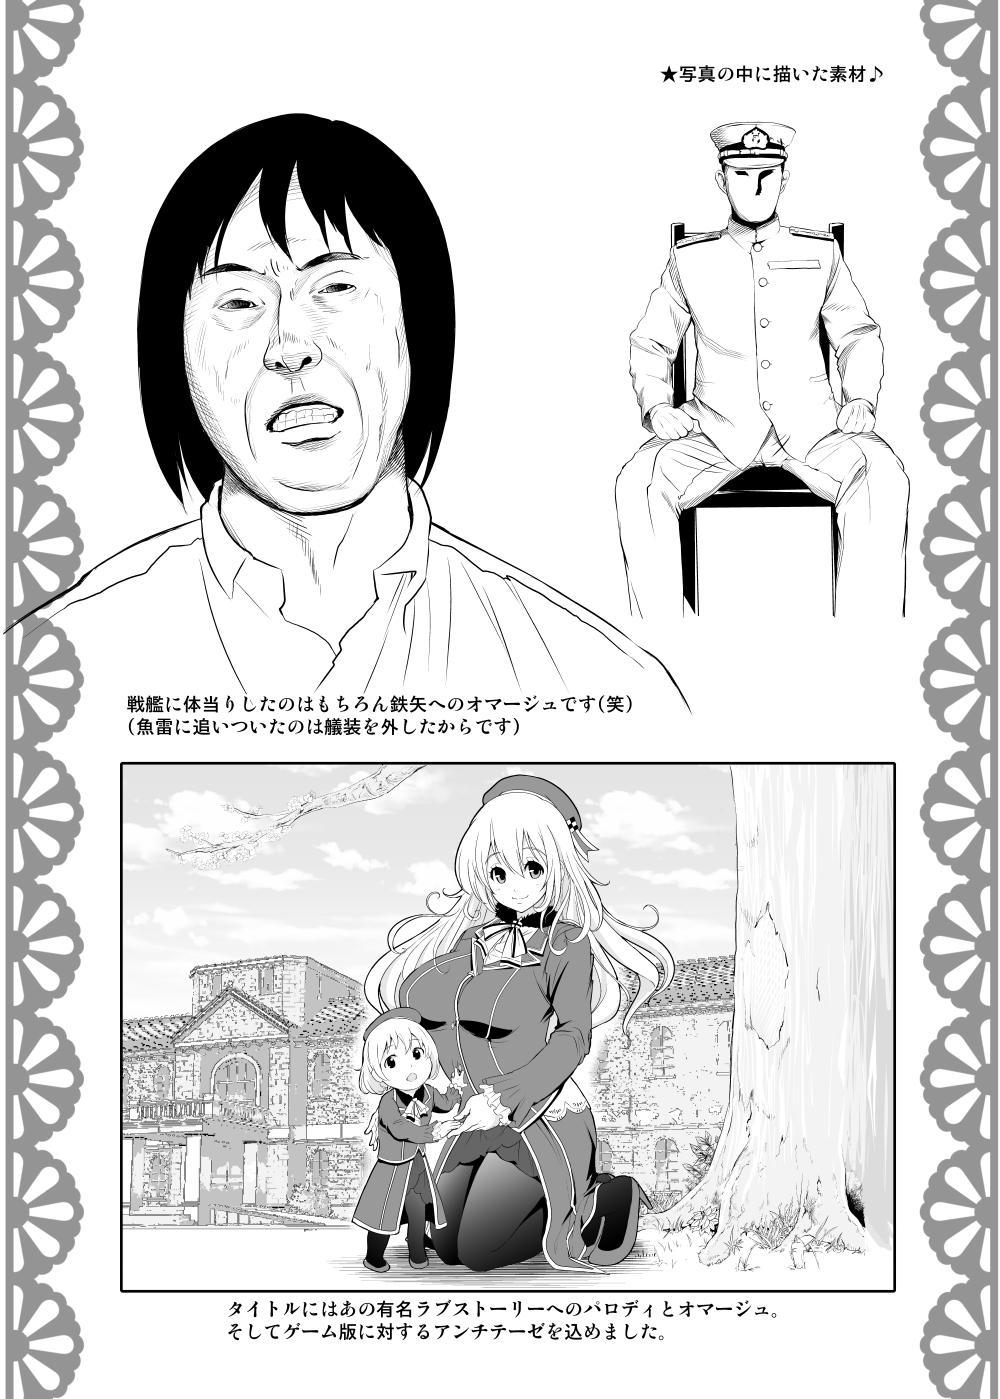 [D-heaven (Amanogami Dai)] 101-taime no Atago-chan (Kantai Collection -KanColle-) [Digital] 35